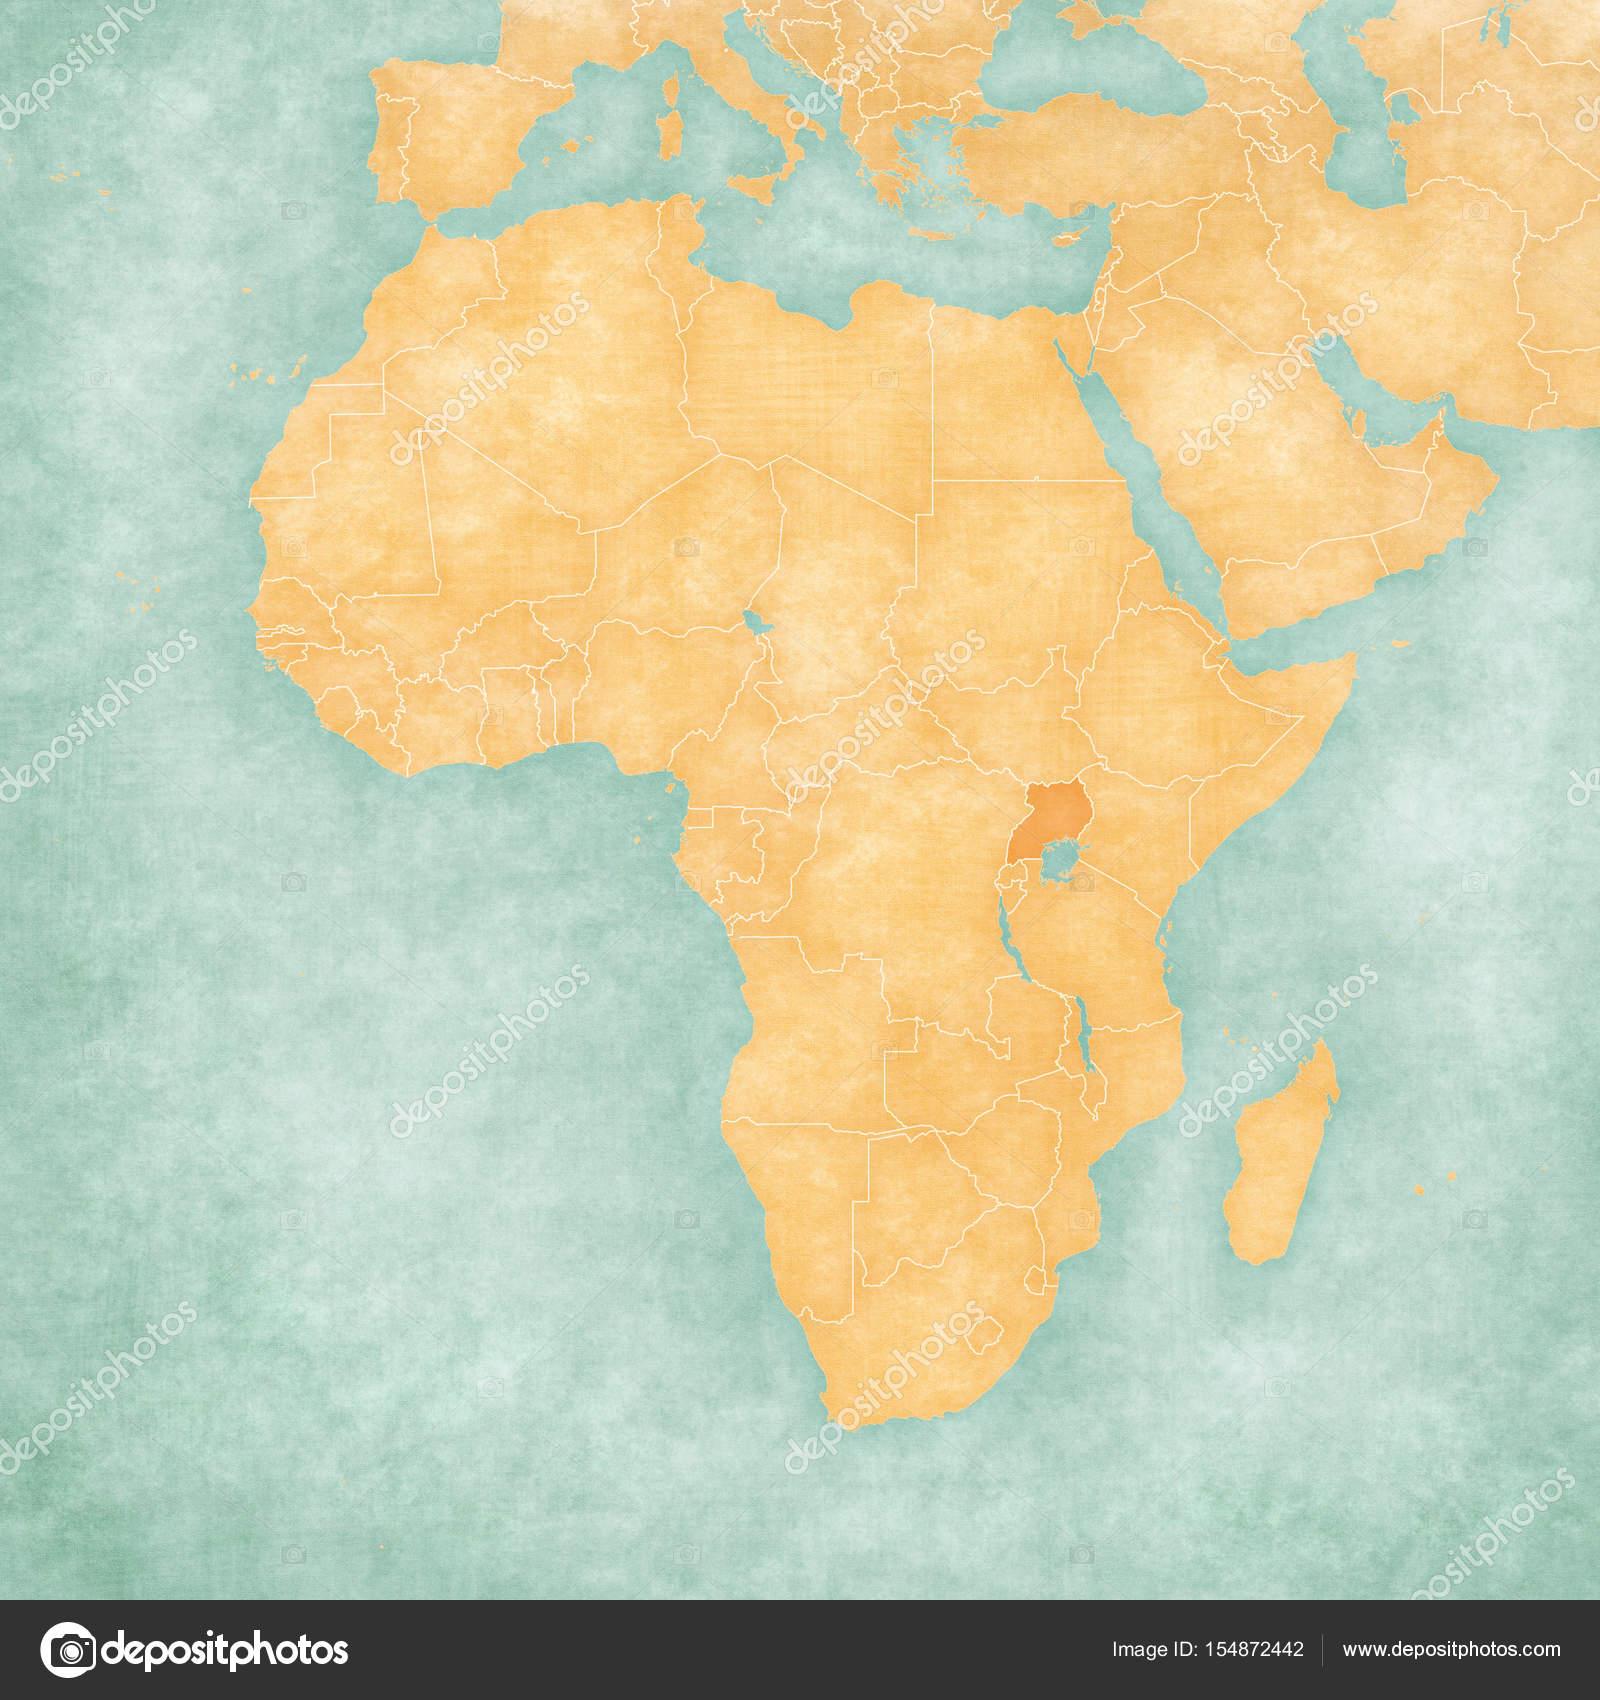 Carte Afrique Ouganda.Carte De L Afrique Ouganda Photographie Tindo C 154872442